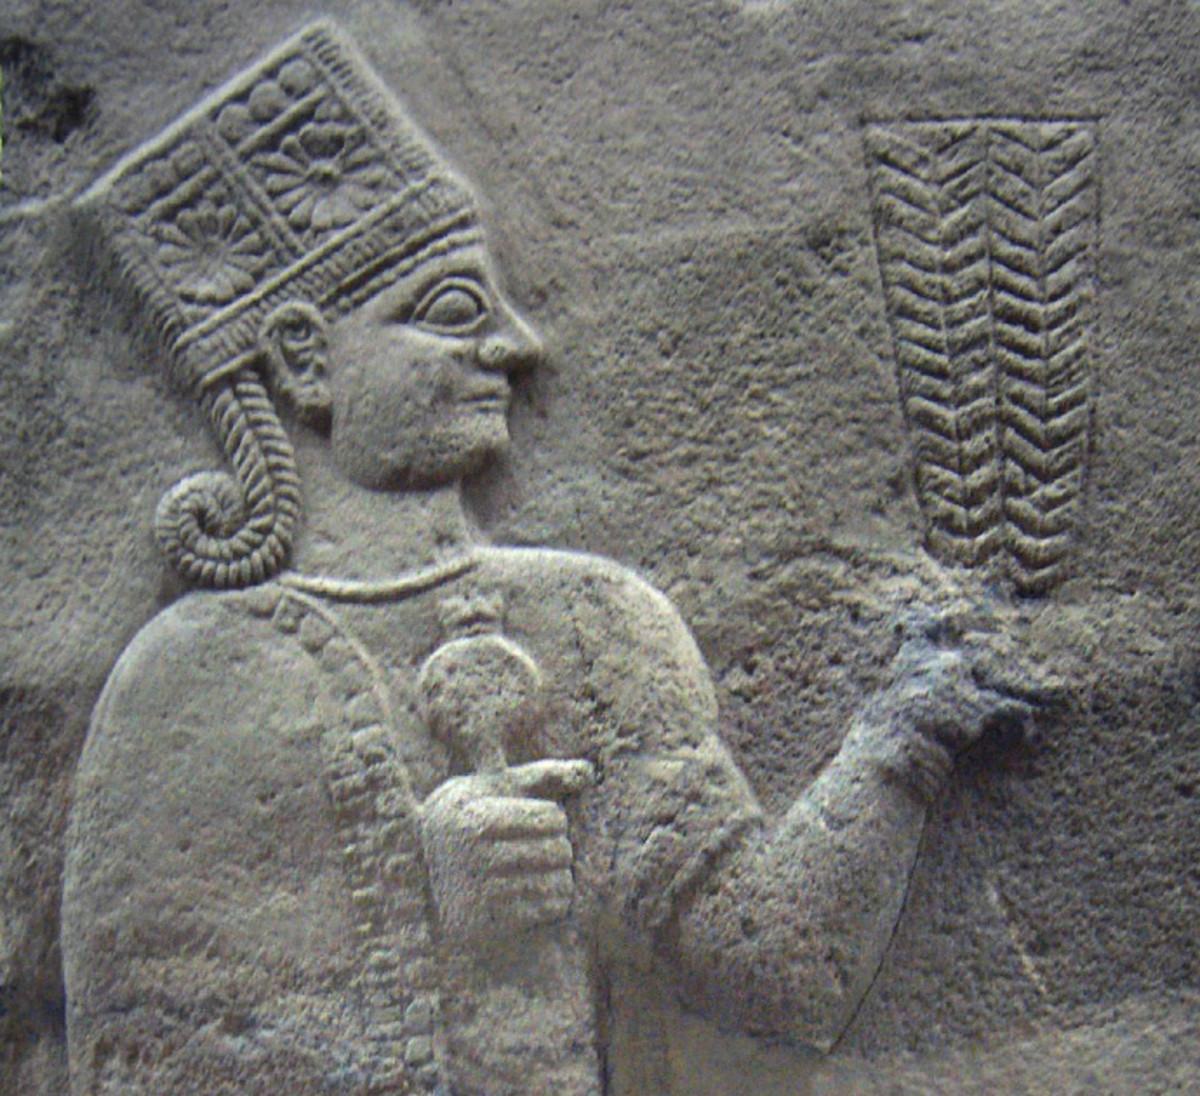 from the Museum of Anatolian Civilization, Turkey